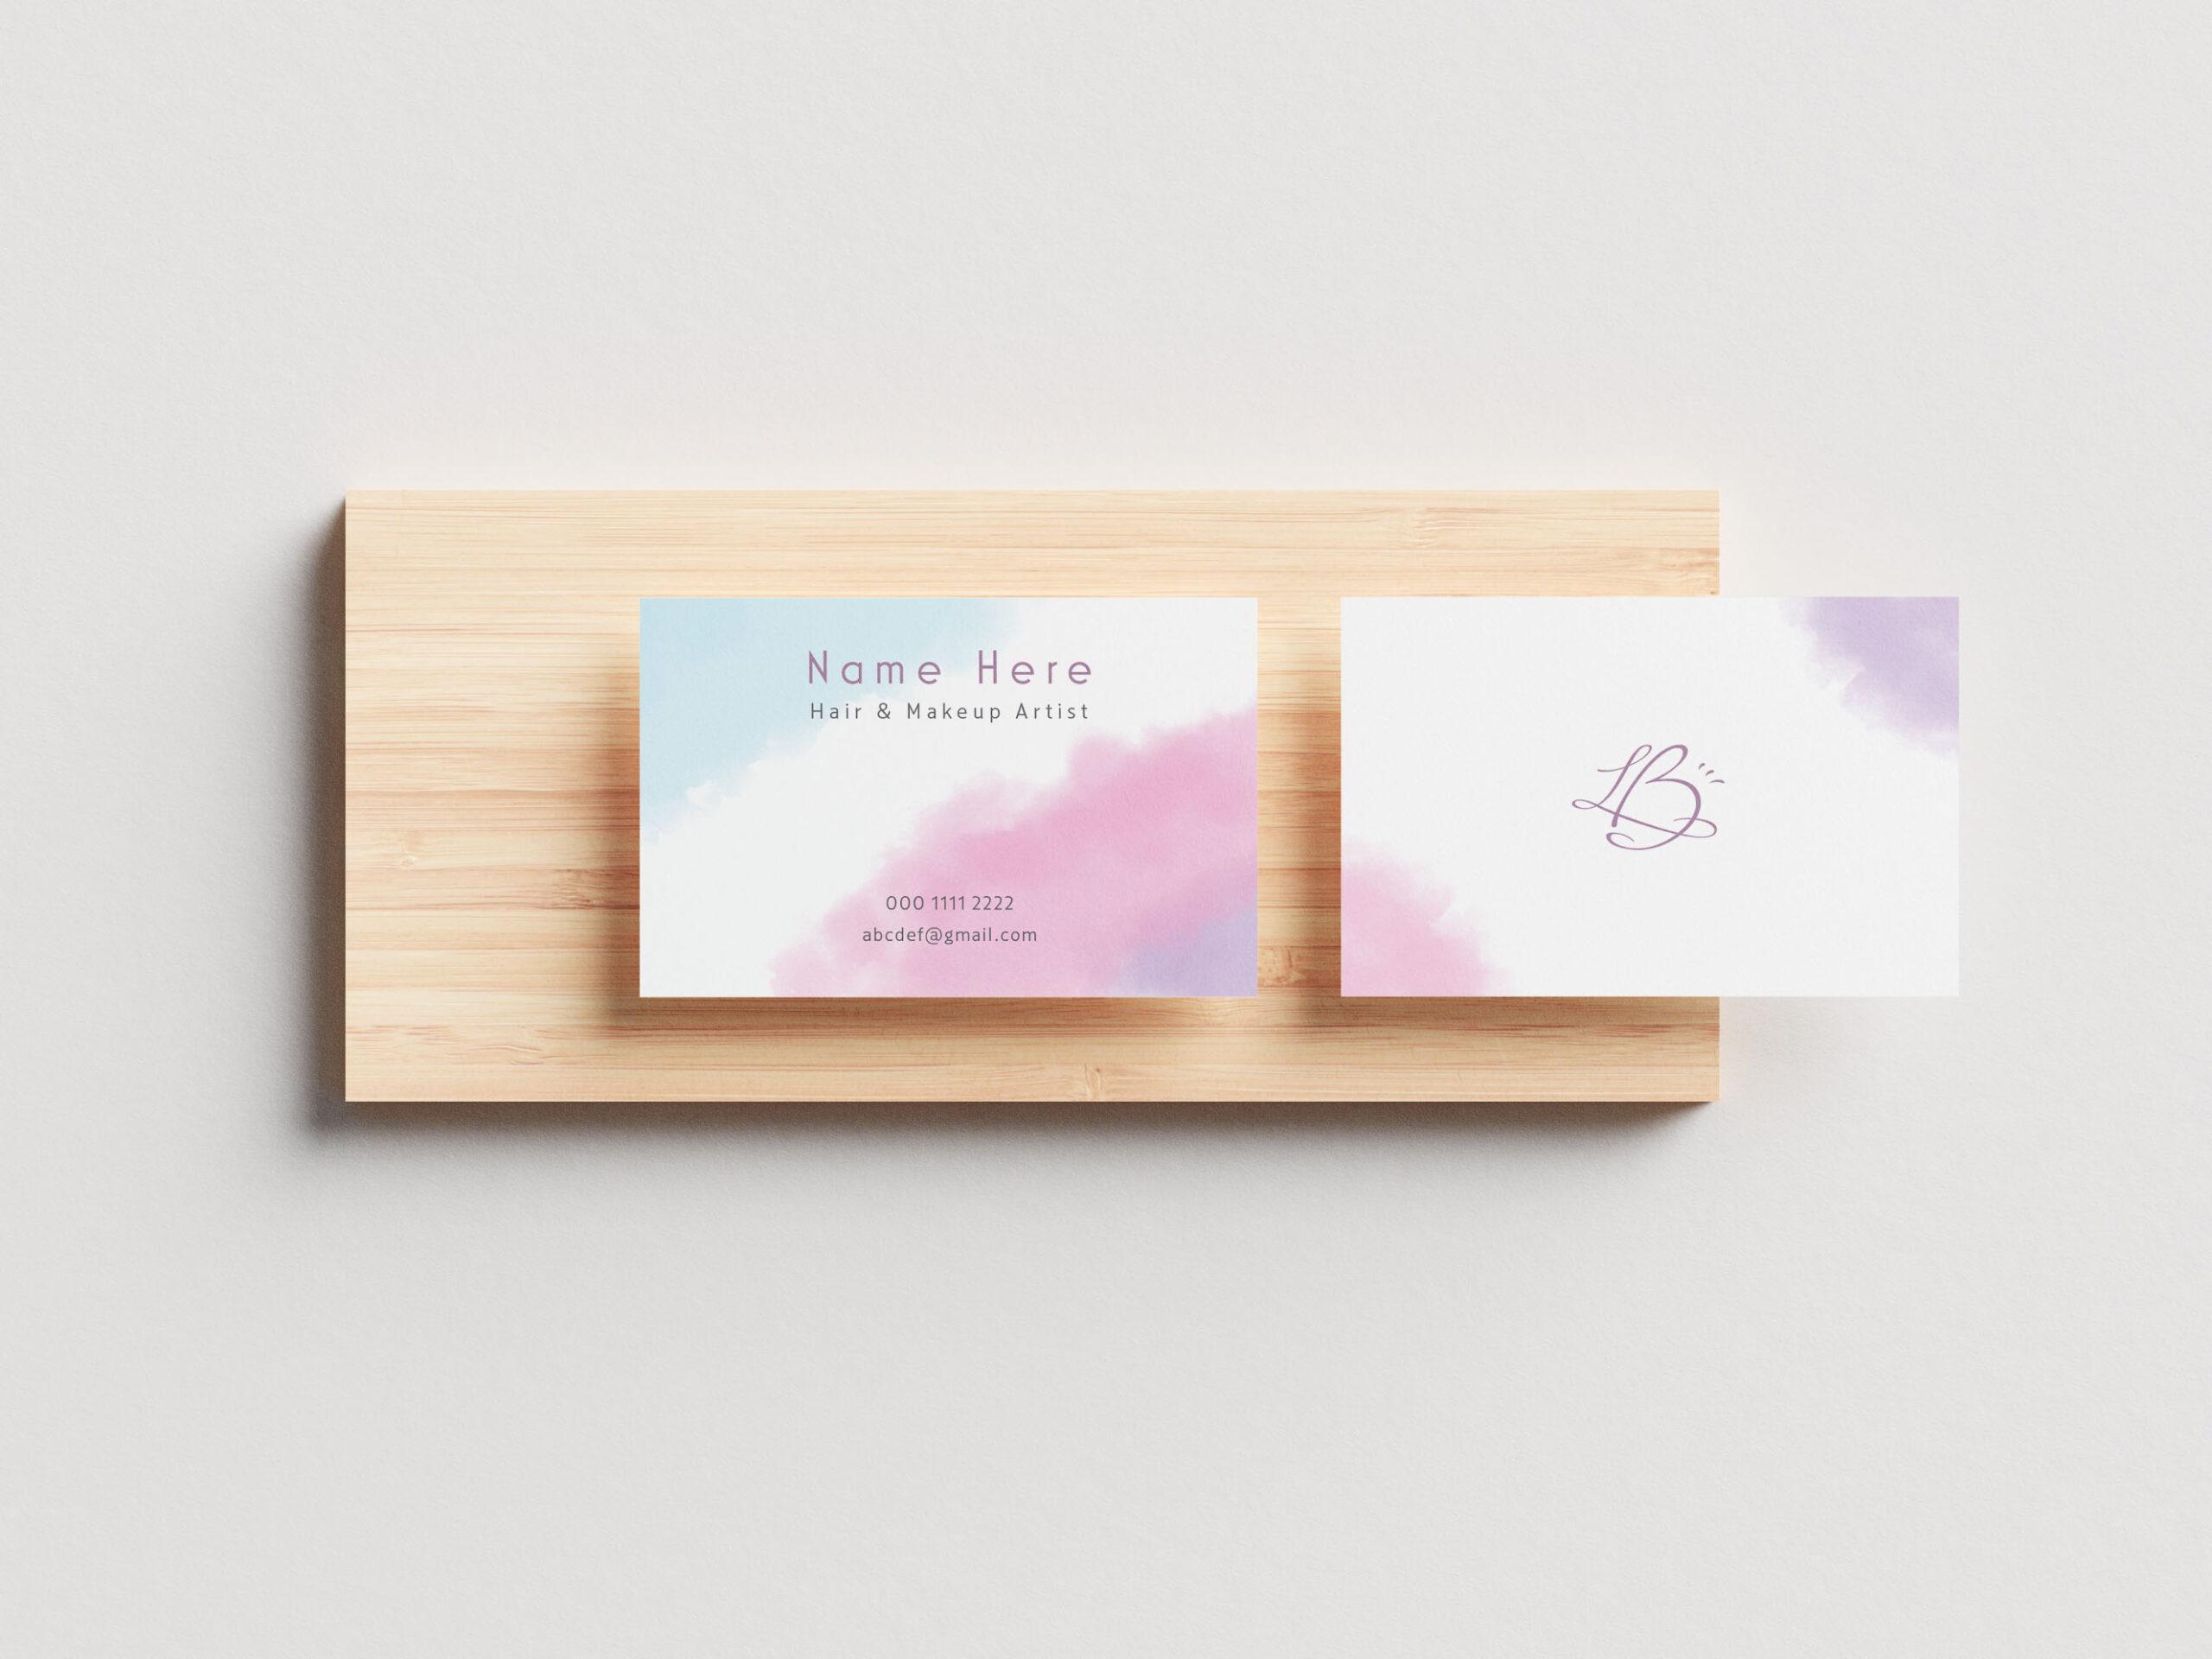 Business-Card_Hair-Makeup-Artist_for-Portfolio